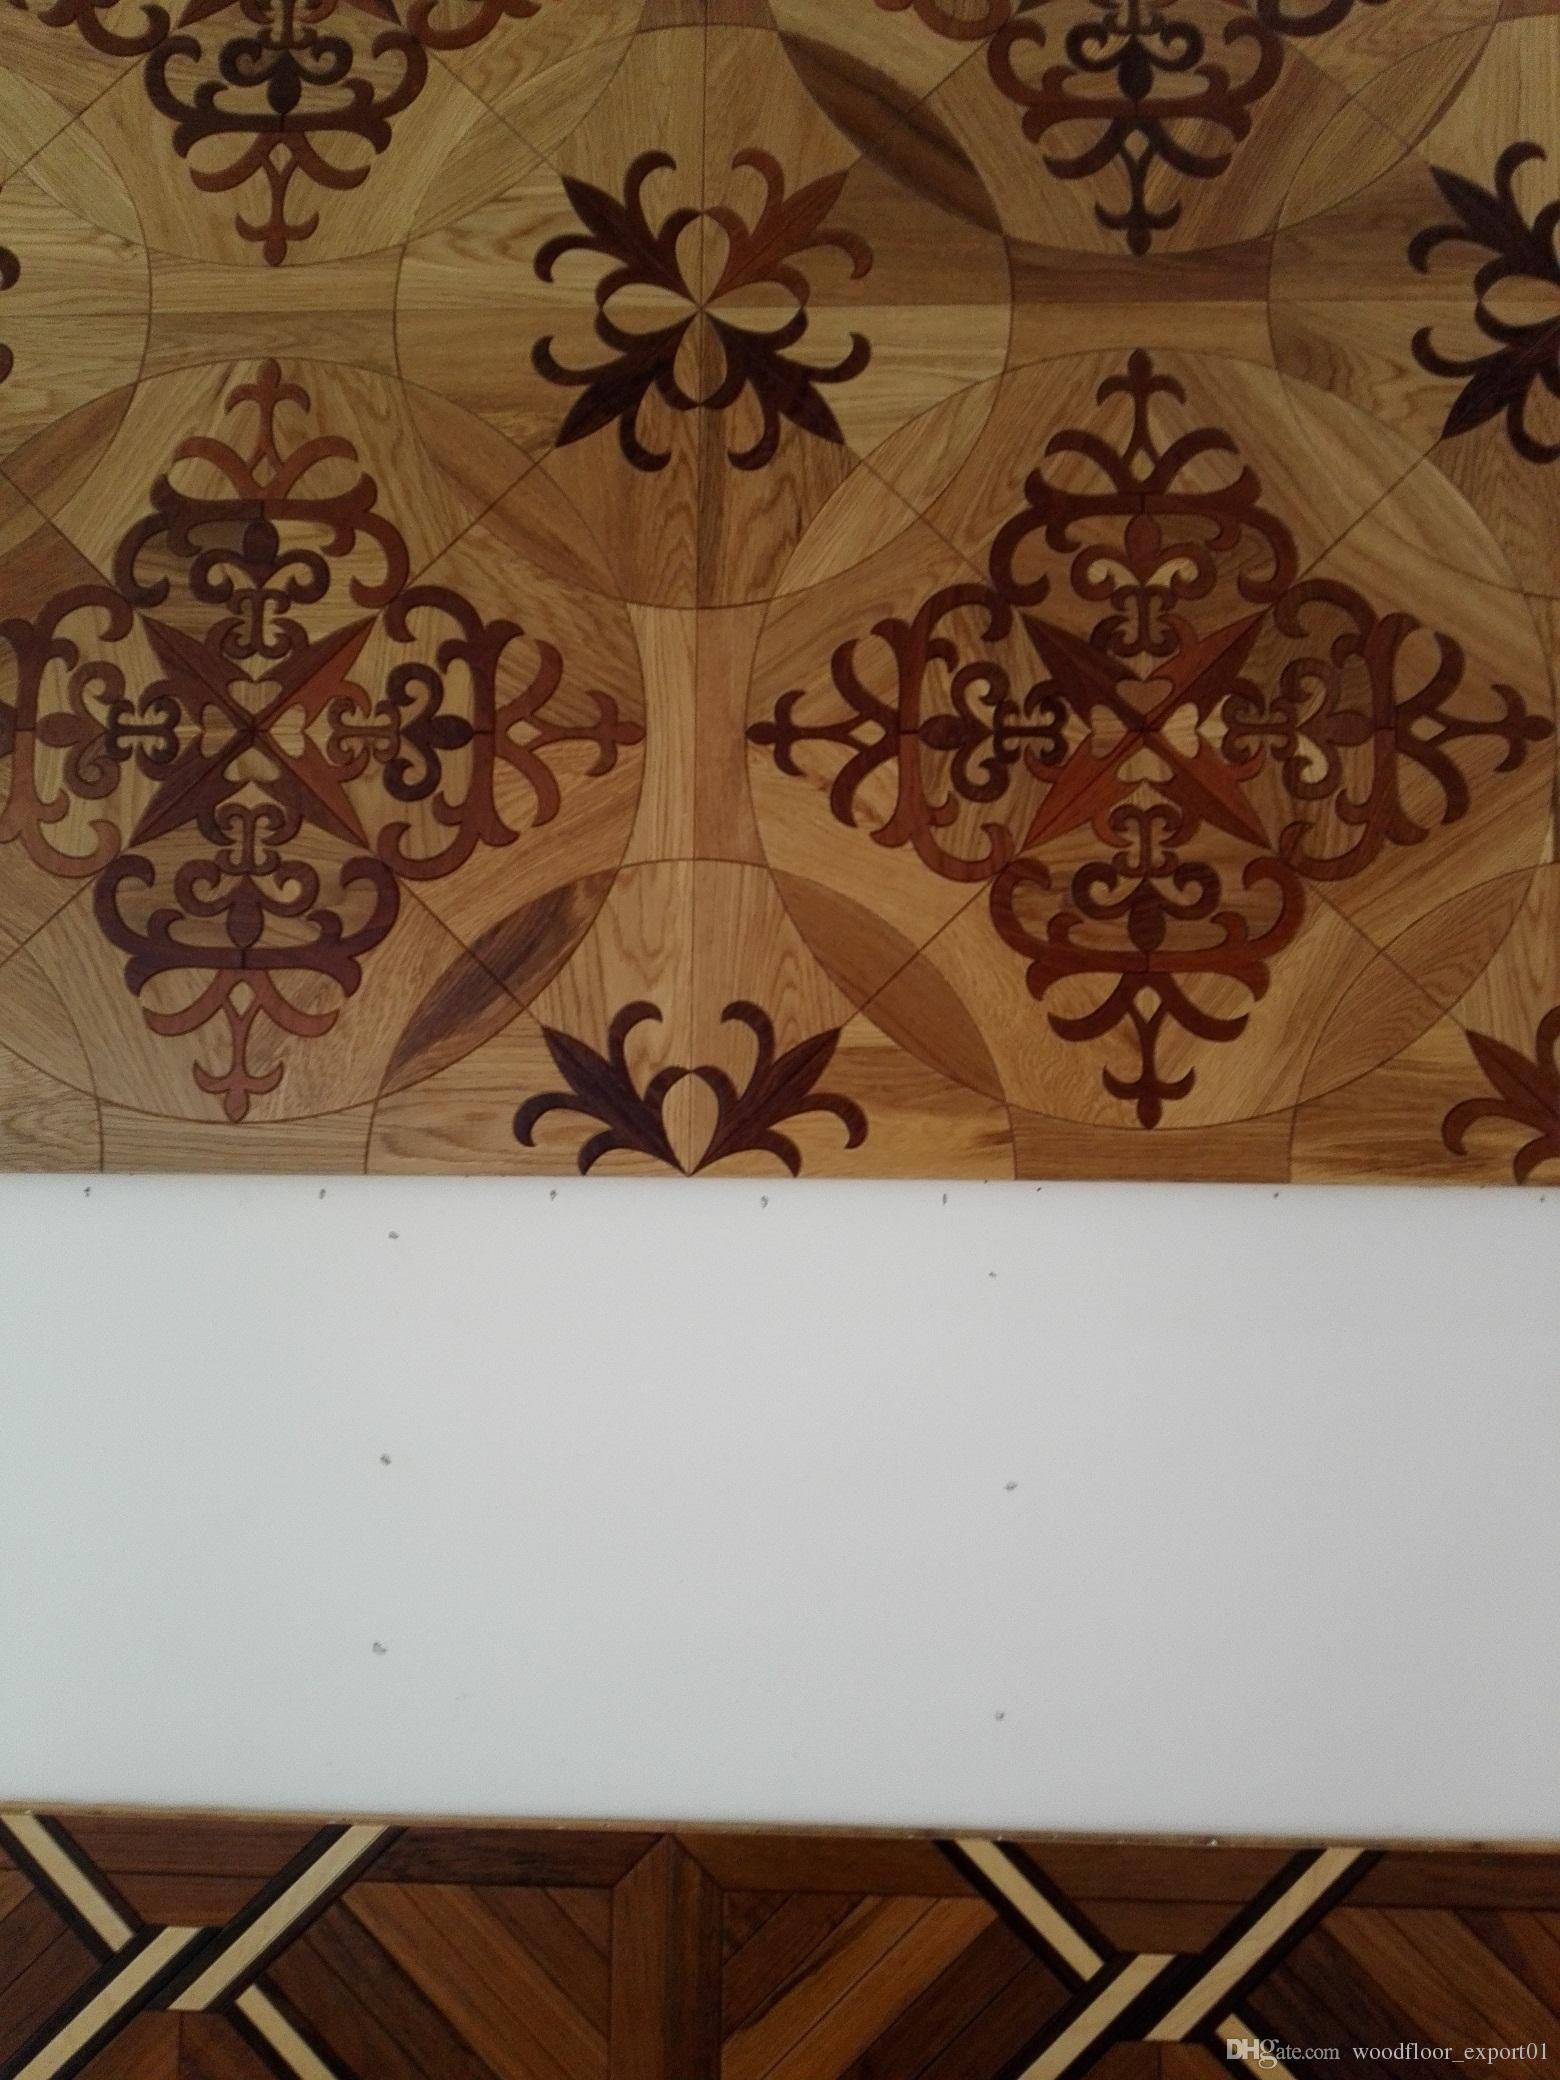 bamboo hardwood flooring vs oak of oak hardwood craft bedroom set carpet tools bamboo sheets flooring in oak hardwood craft bedroom set carpet tools bamboo sheets flooring tool carpet cleaner cleaning carpet tools bedroom set livingmall flooring tool online